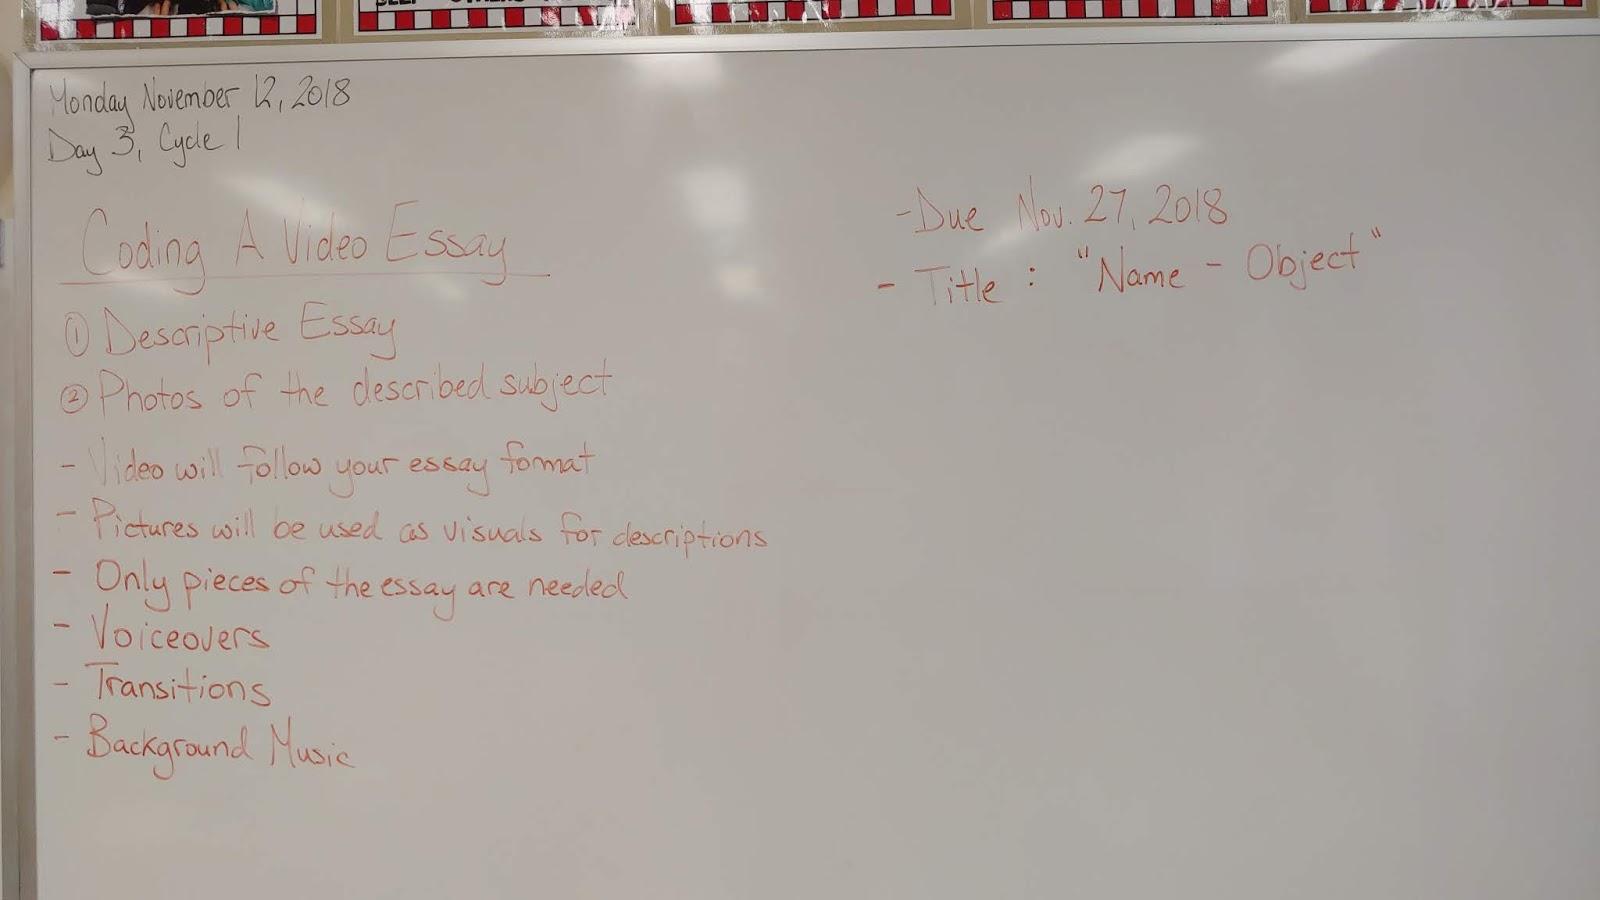 Mr Watts Grade A Classroom Blog Coding A Video Essay Assignment Coding A Video Essay Assignment